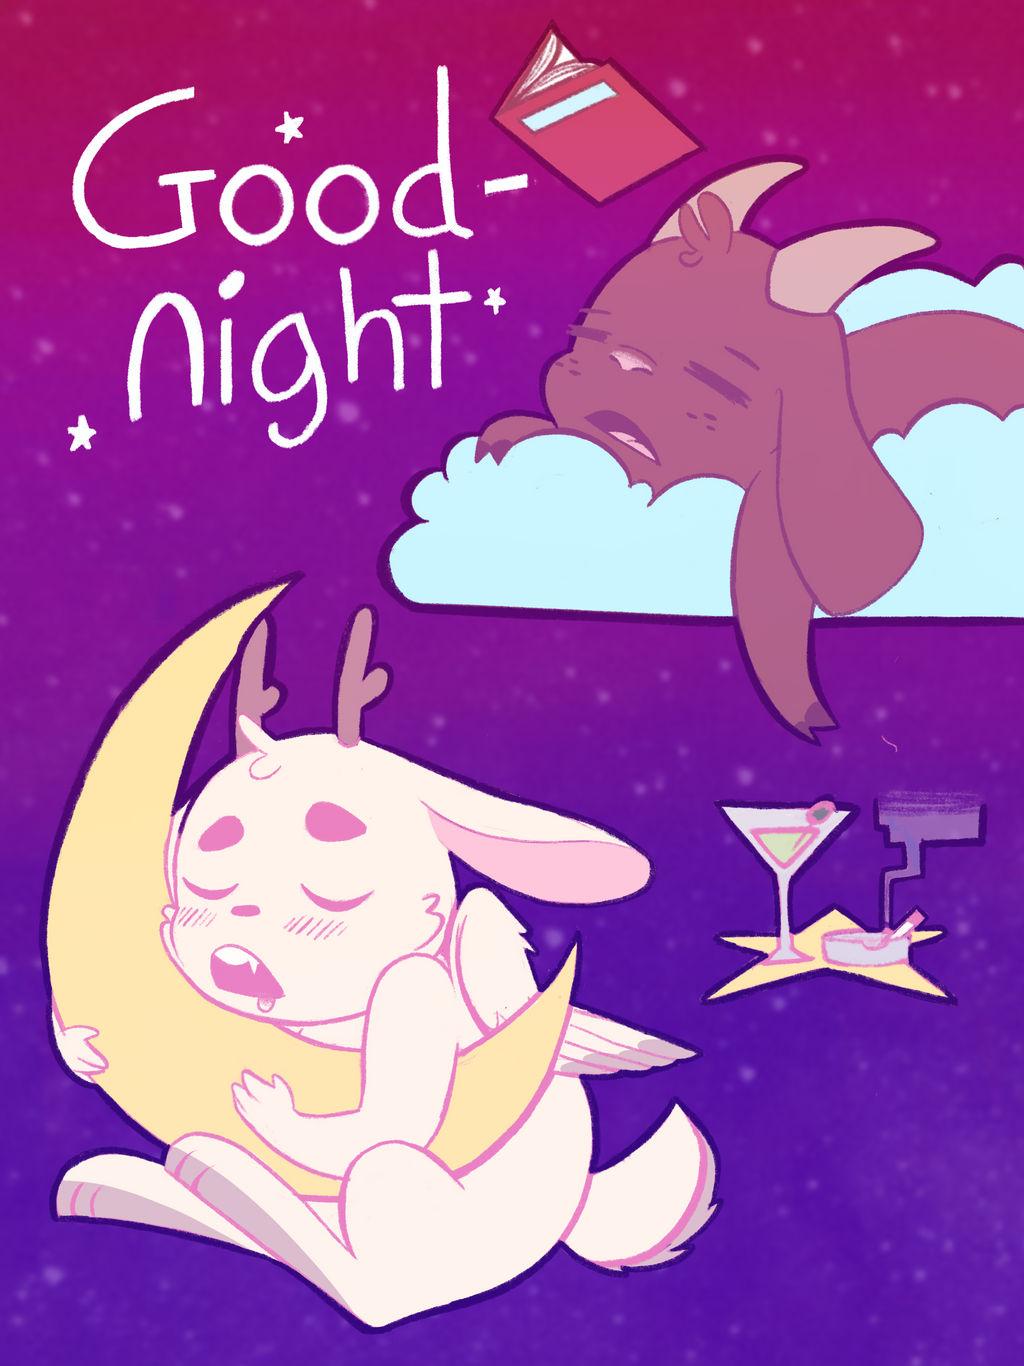 Nighty night cartoon bazooka nighty night cartoon bazooka jpg 1024x1366 Nighty  night cartoon 836771daa